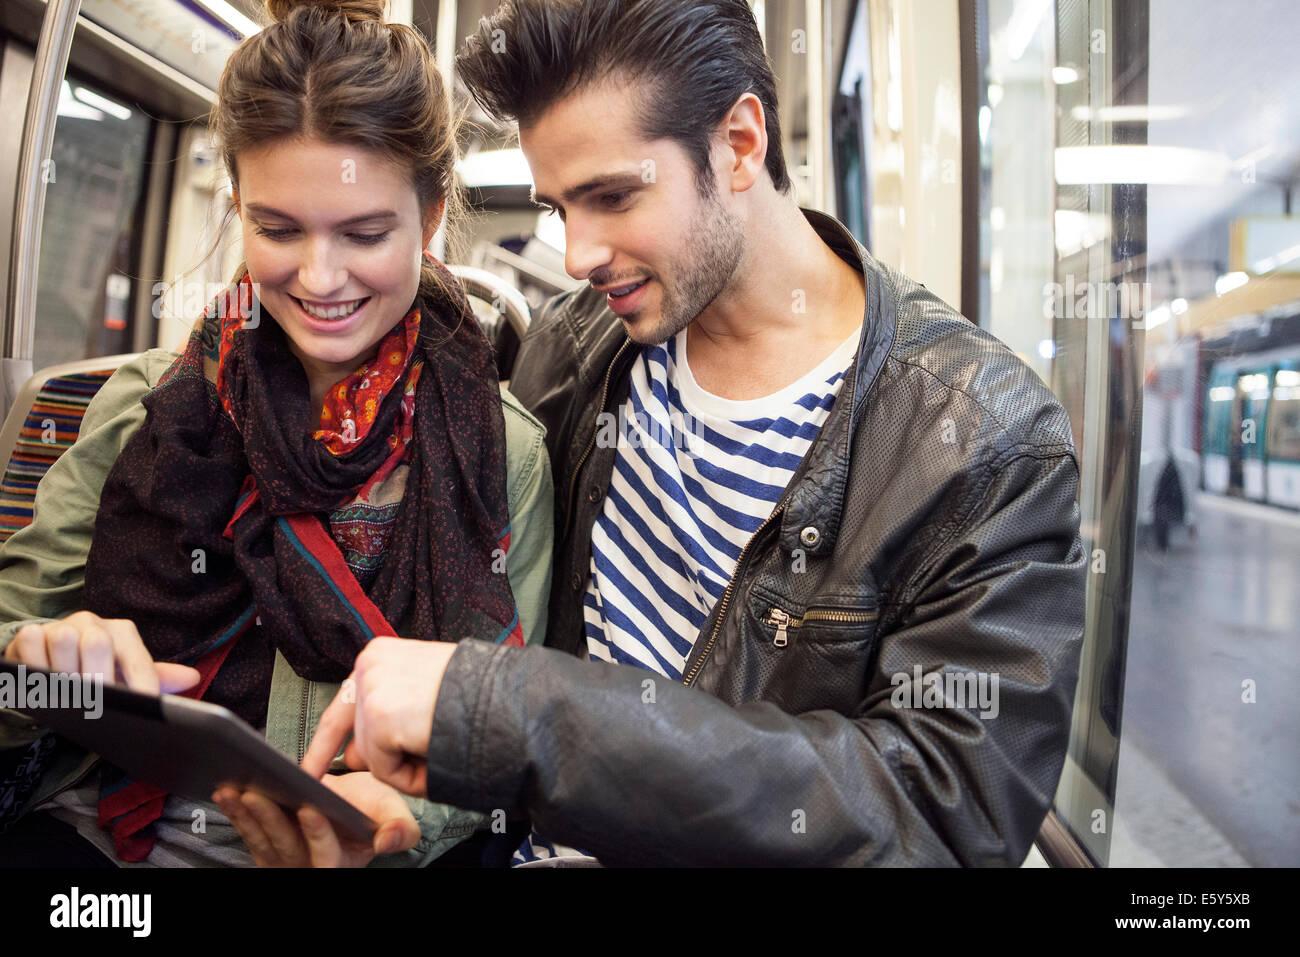 Pareja joven caballo metro mirando juntos tableta digital Imagen De Stock